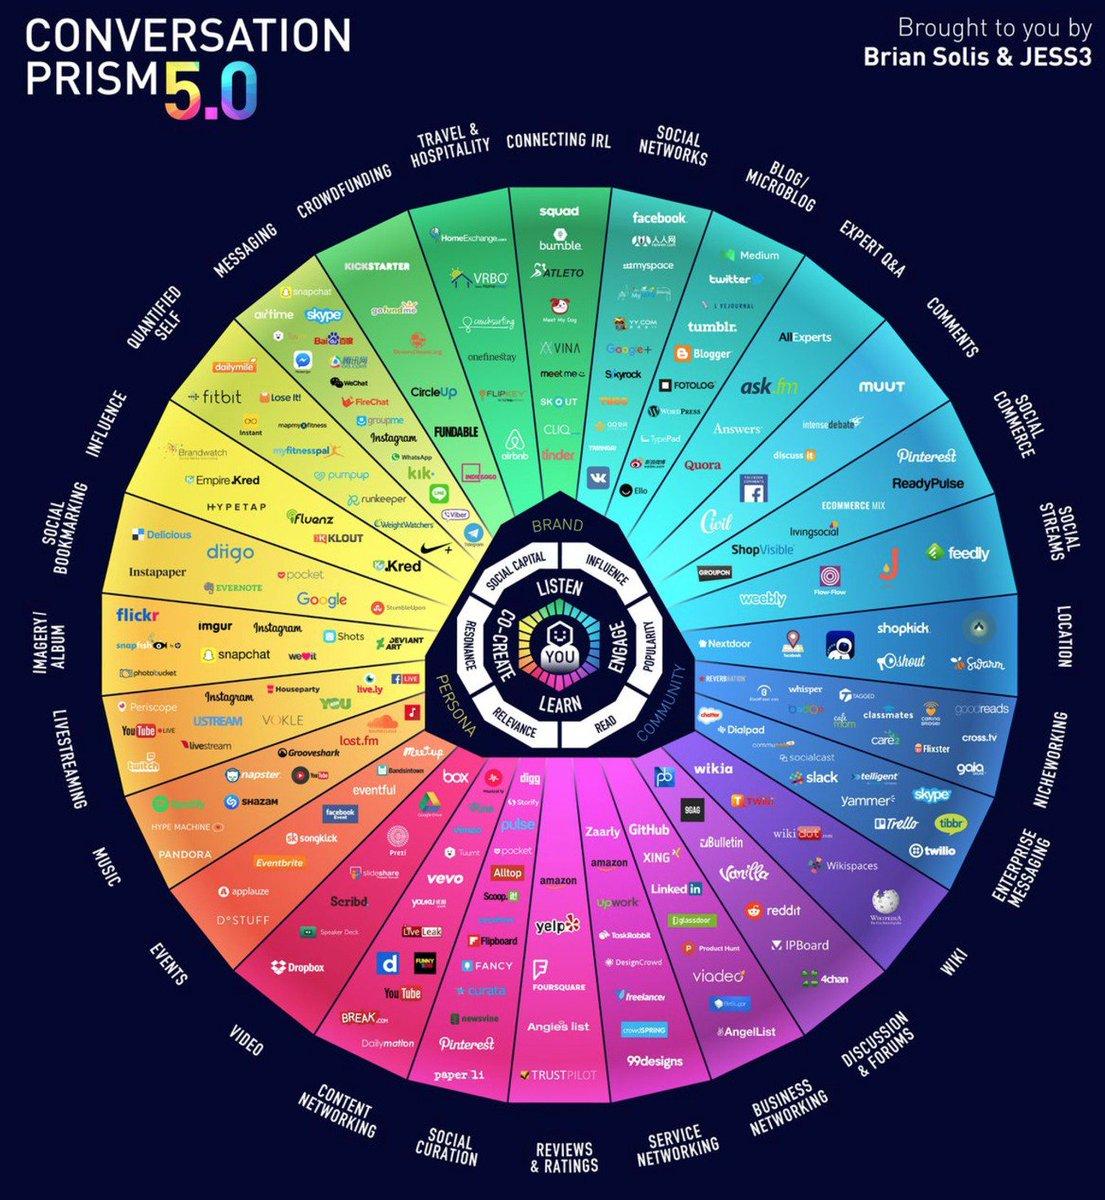 2017 Conversational Social Networks: 28 User-Centric Usage Types @briansolis @JESS3 #DigitalMarketing #UX #SocialMedia #SMM #GrowthHacking<br>http://pic.twitter.com/QqLv5hc8PR